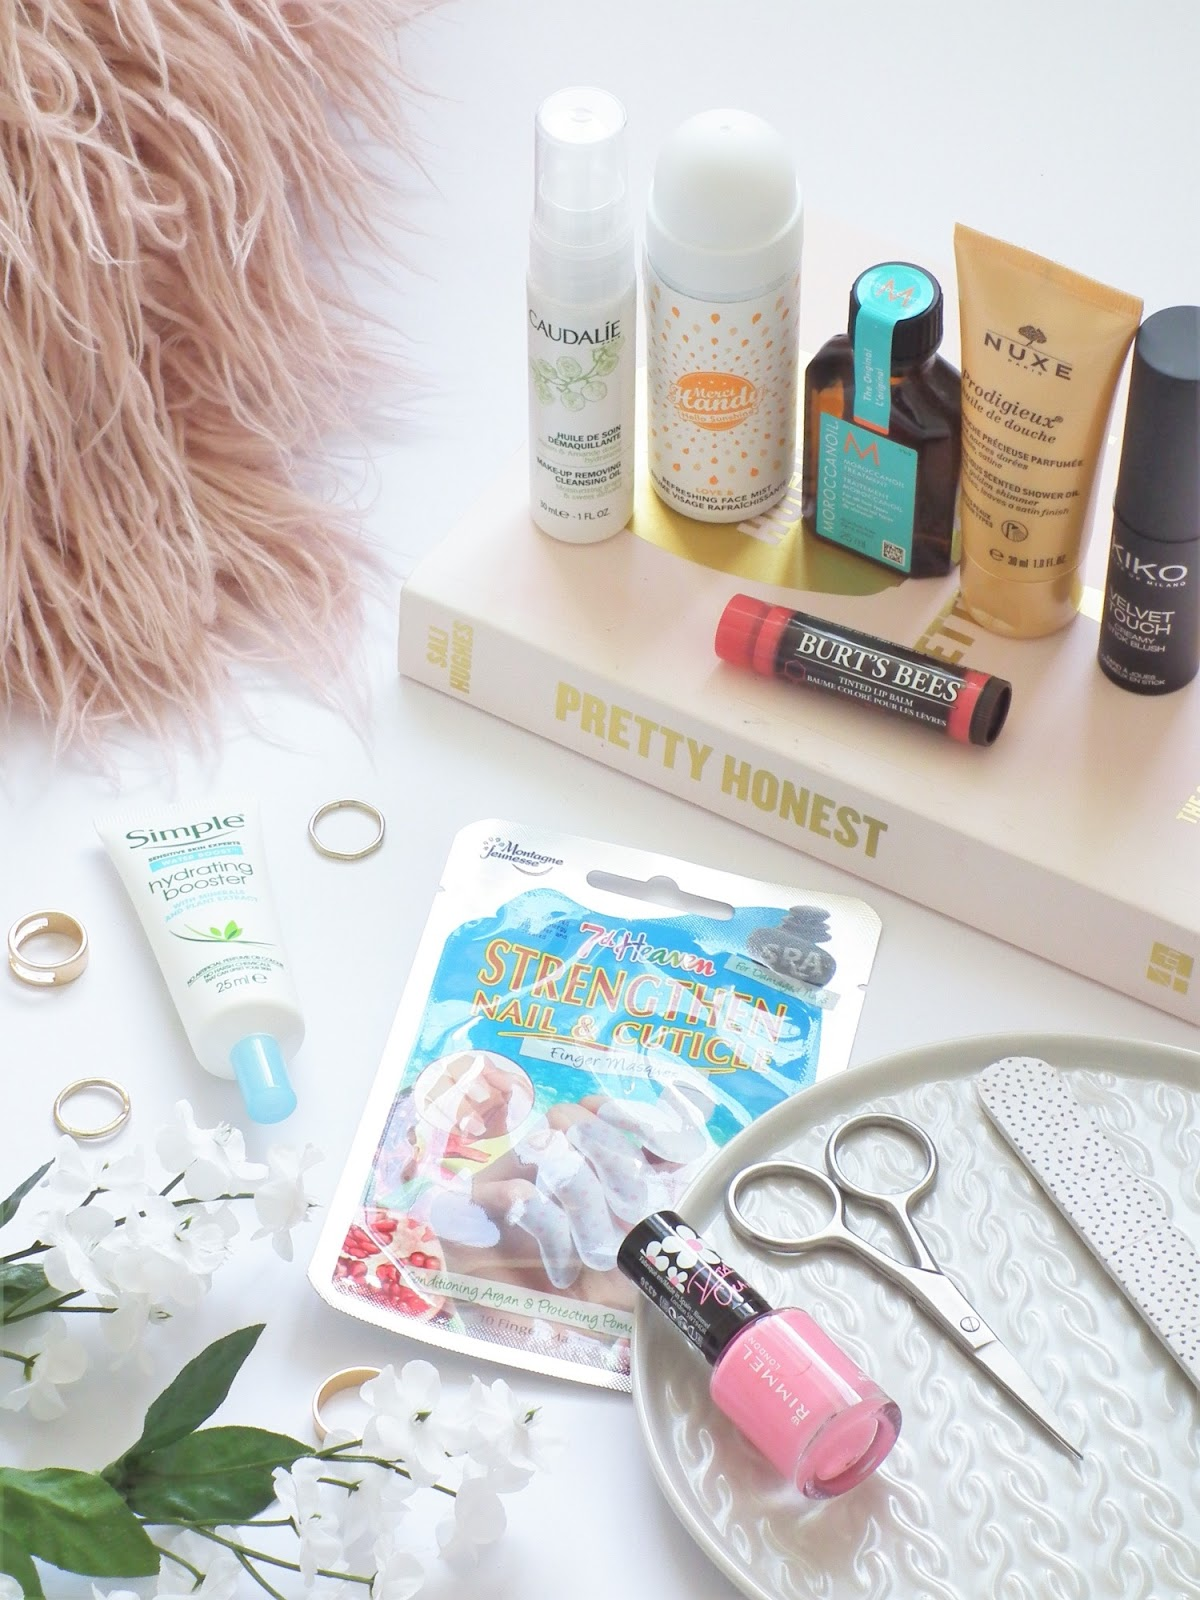 Latest In Beauty - Beauty Guru Box*   First Impressions